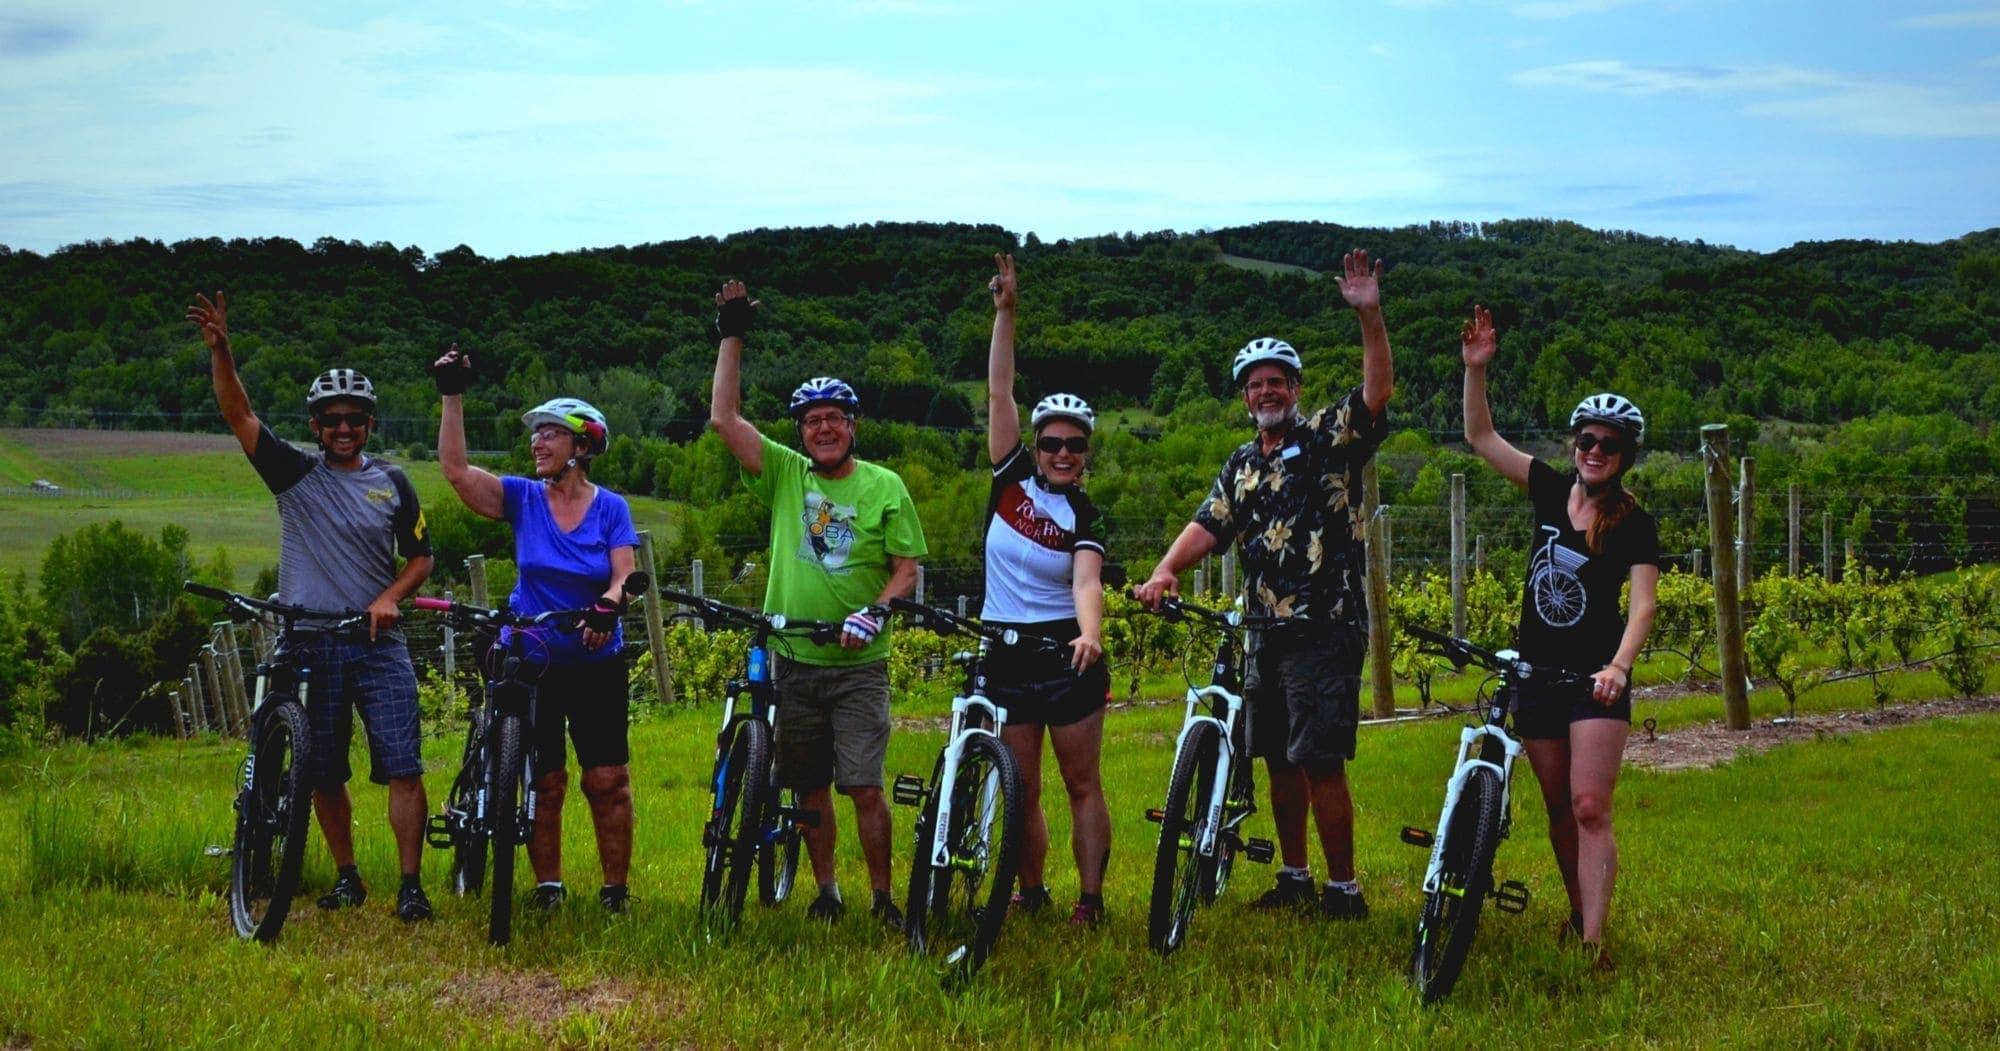 grand traverse bike tours cycle the vineyards tour. Black Bedroom Furniture Sets. Home Design Ideas